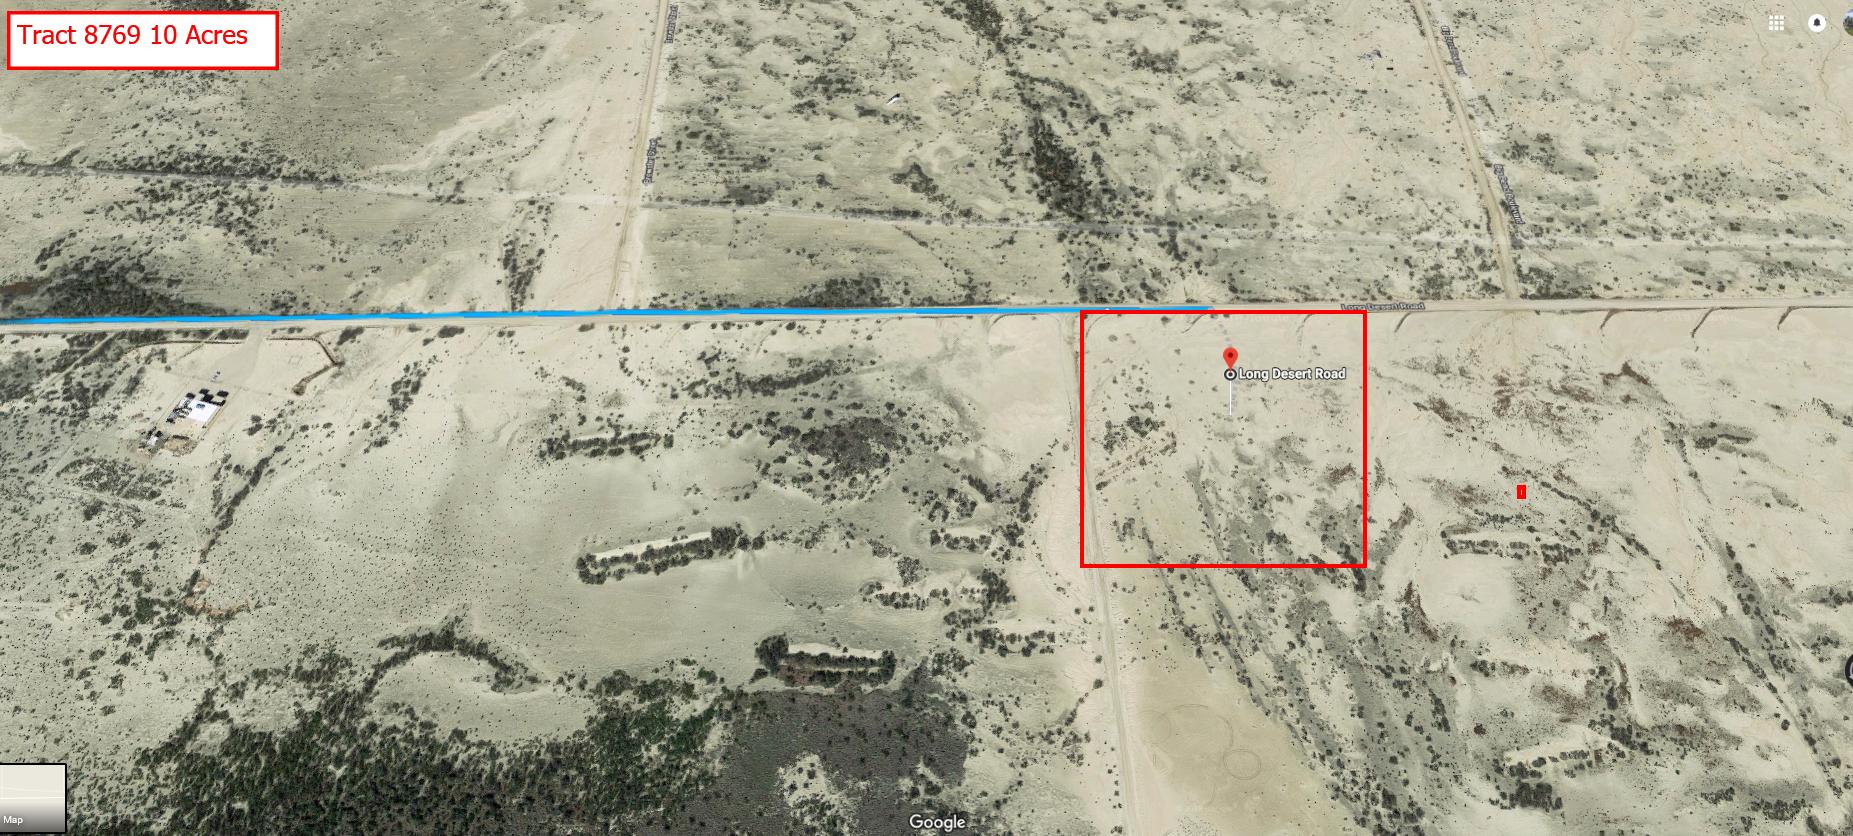 Tract 8769 terrain